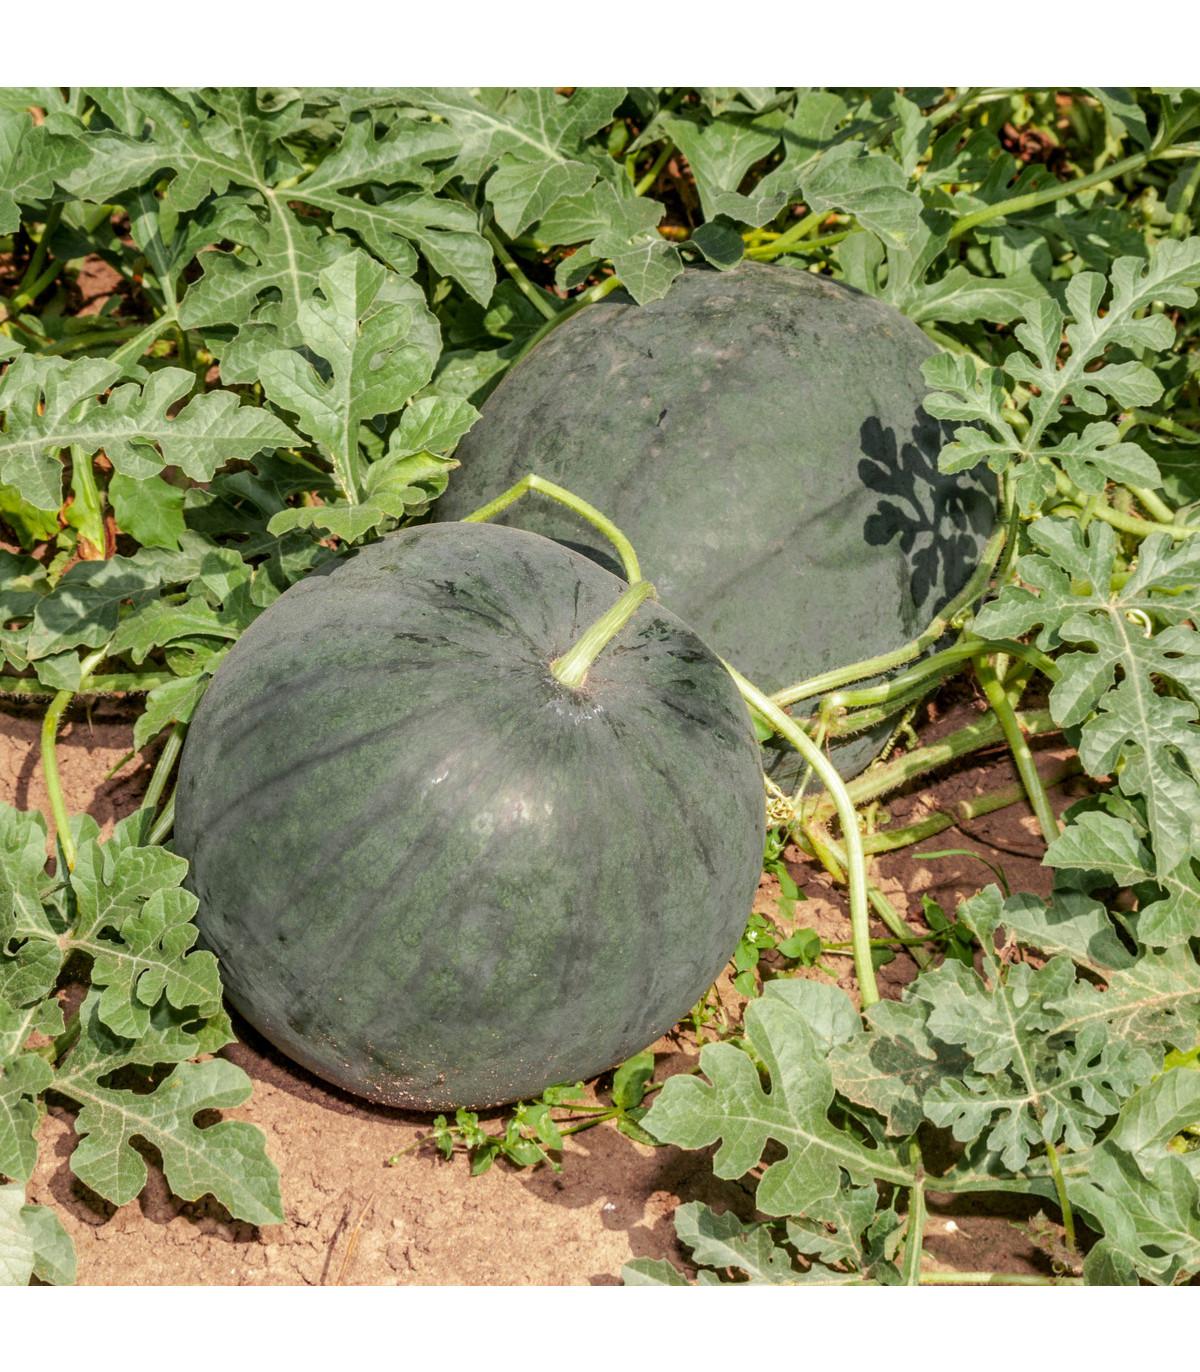 Vodní meloun Lajko F1 - Citrullus lanatus - osivo melounu - 5 ks